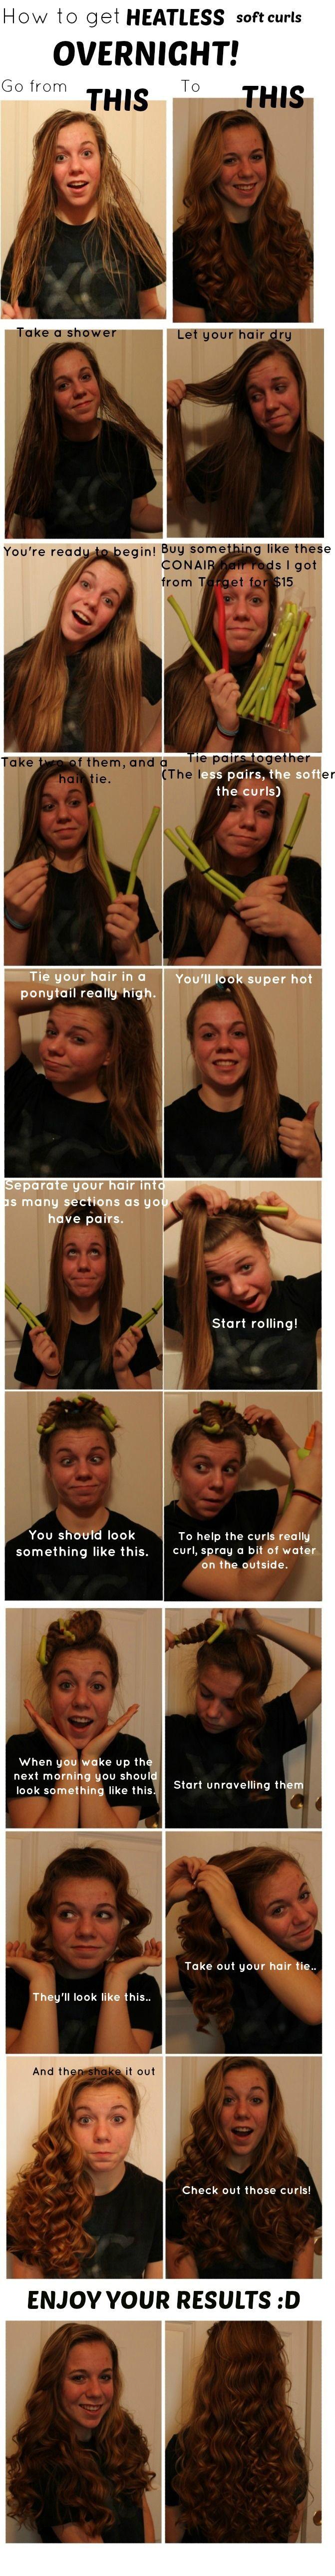 best images about beauty u hair on pinterest virgin hair